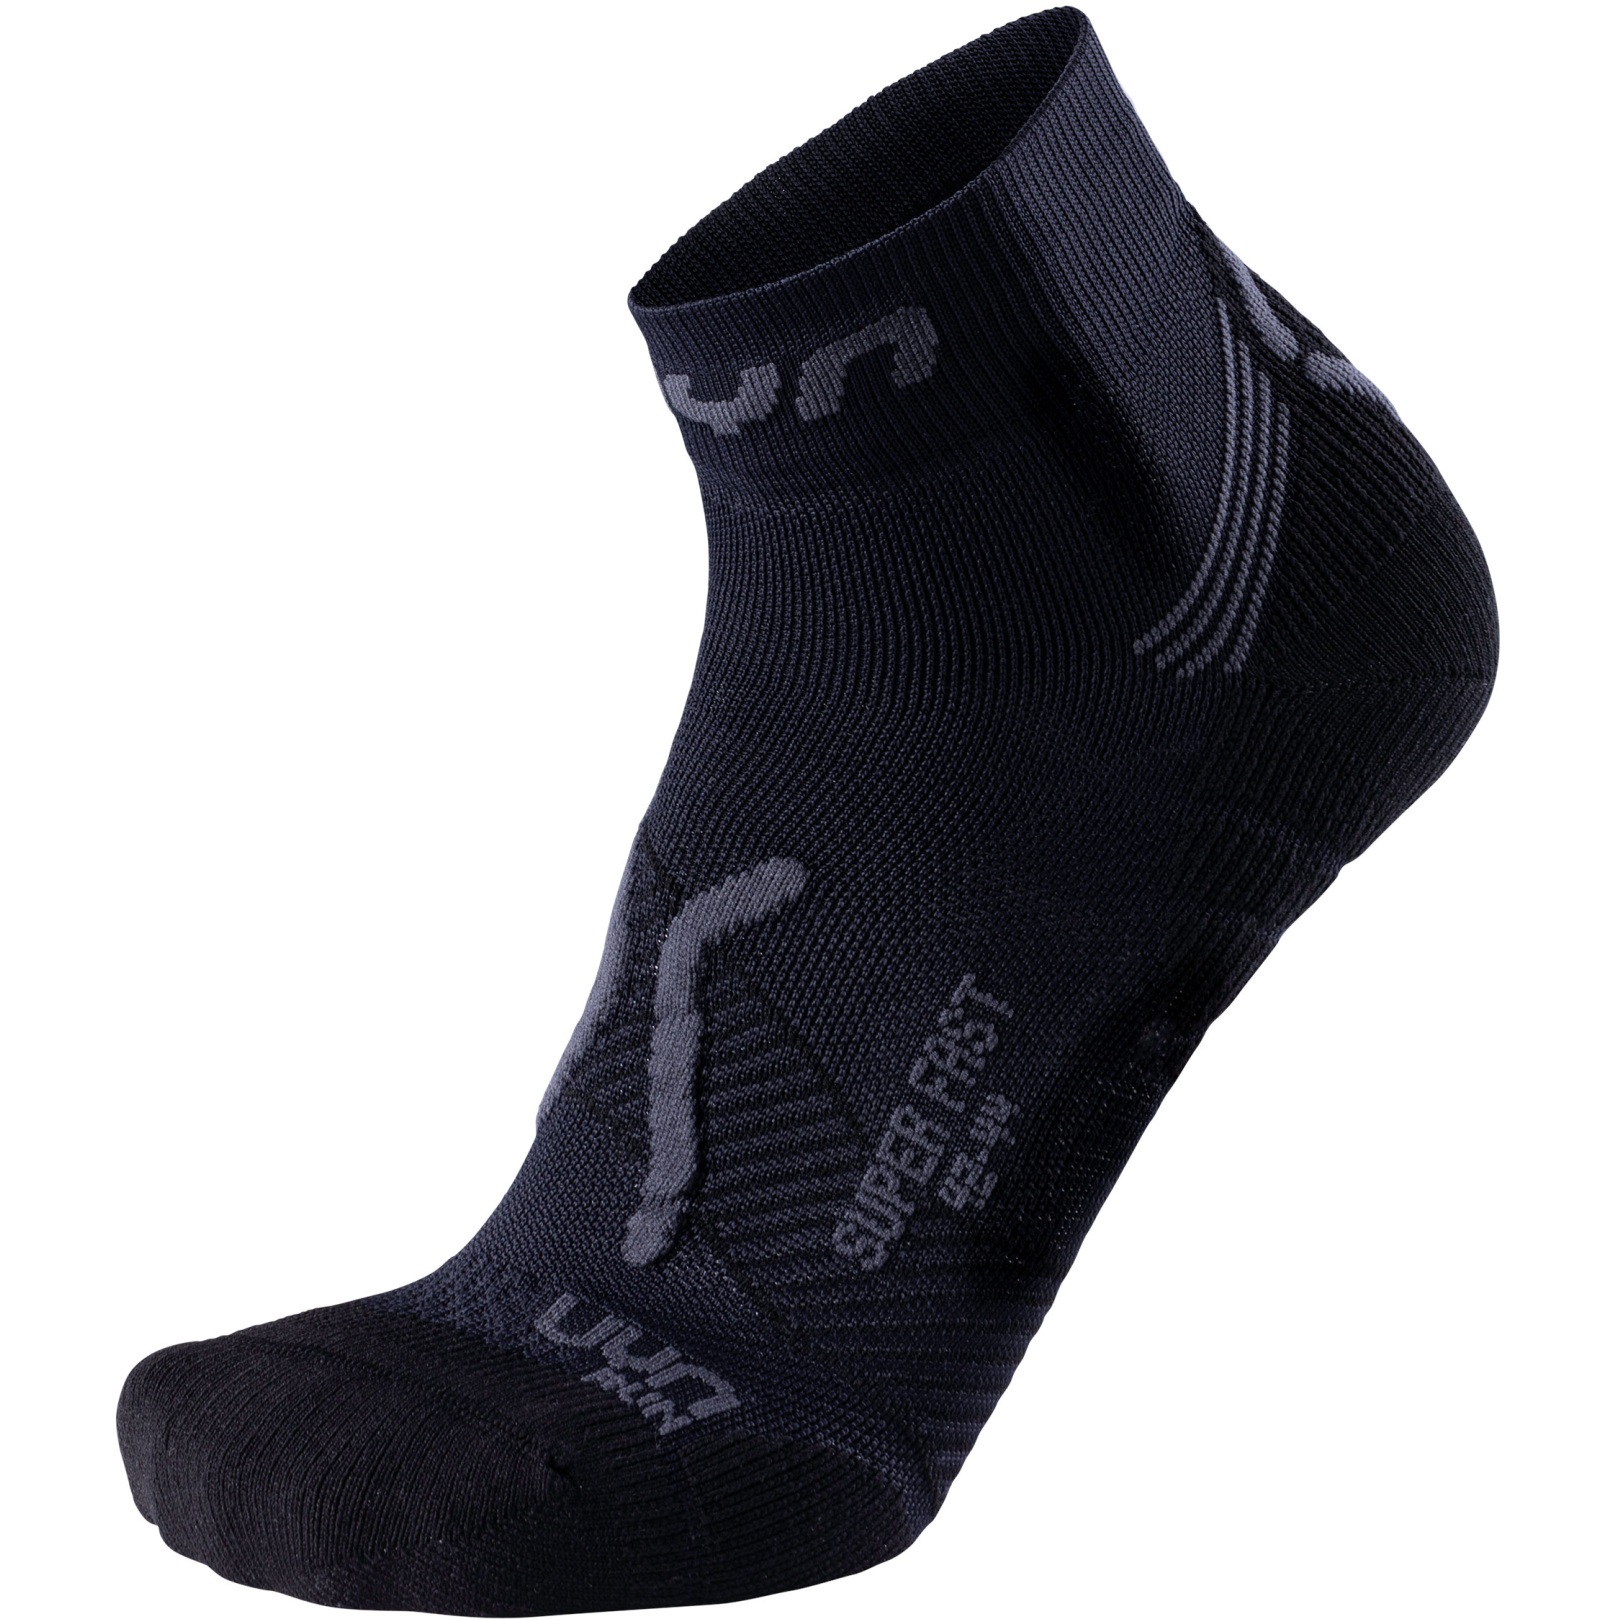 UYN Running Super Fast Socken - Black/Anthracite